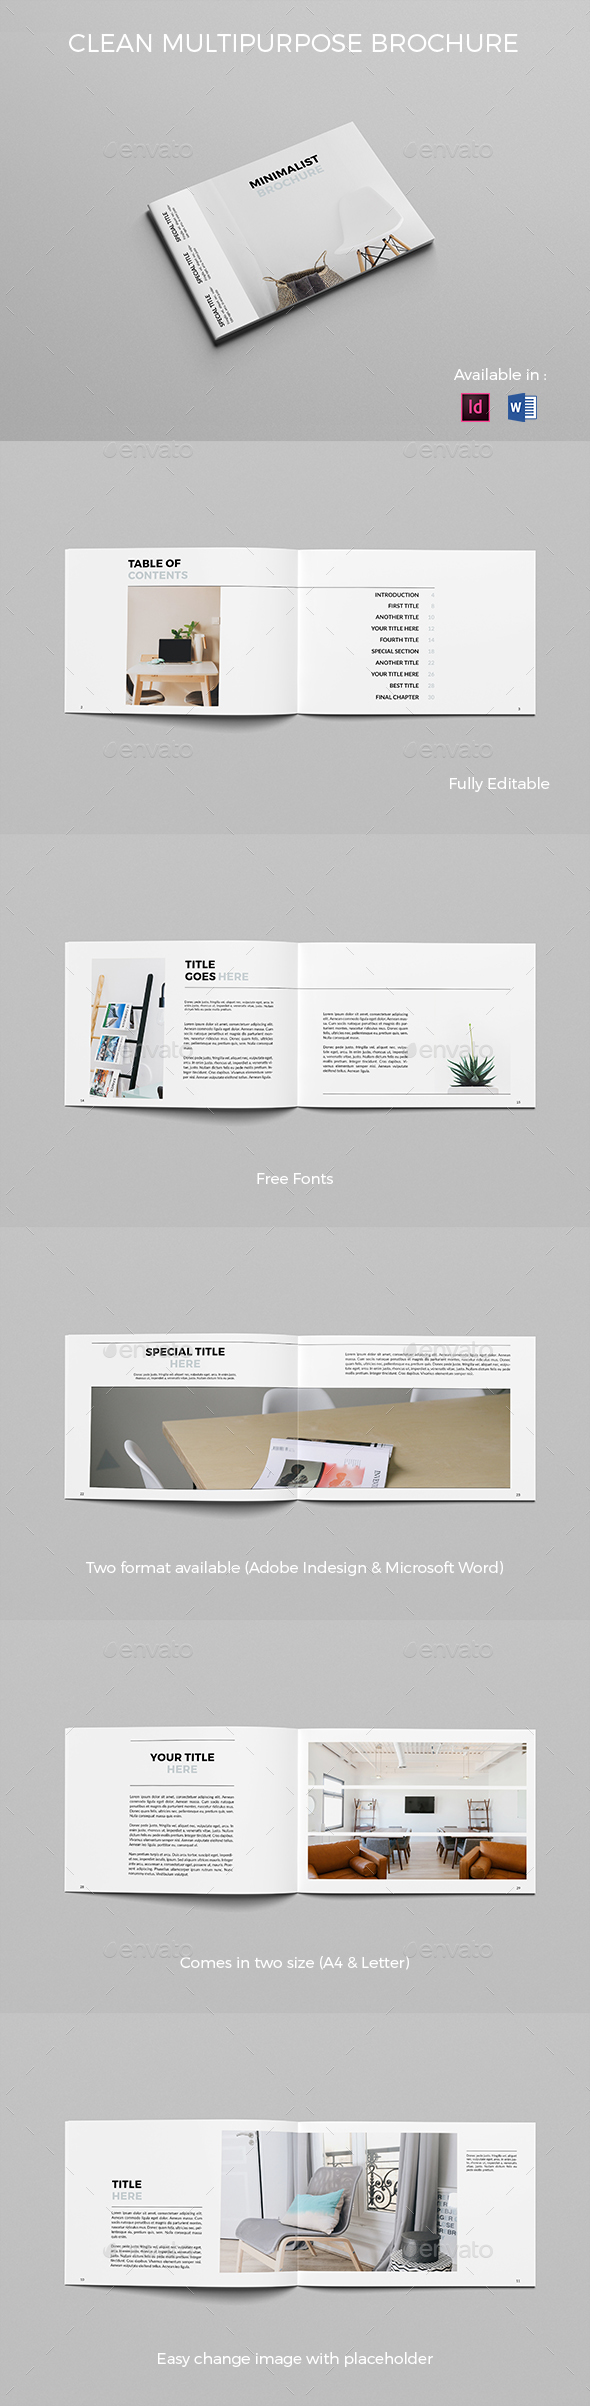 Clean Brochure Landscape - Brochures Print Templates